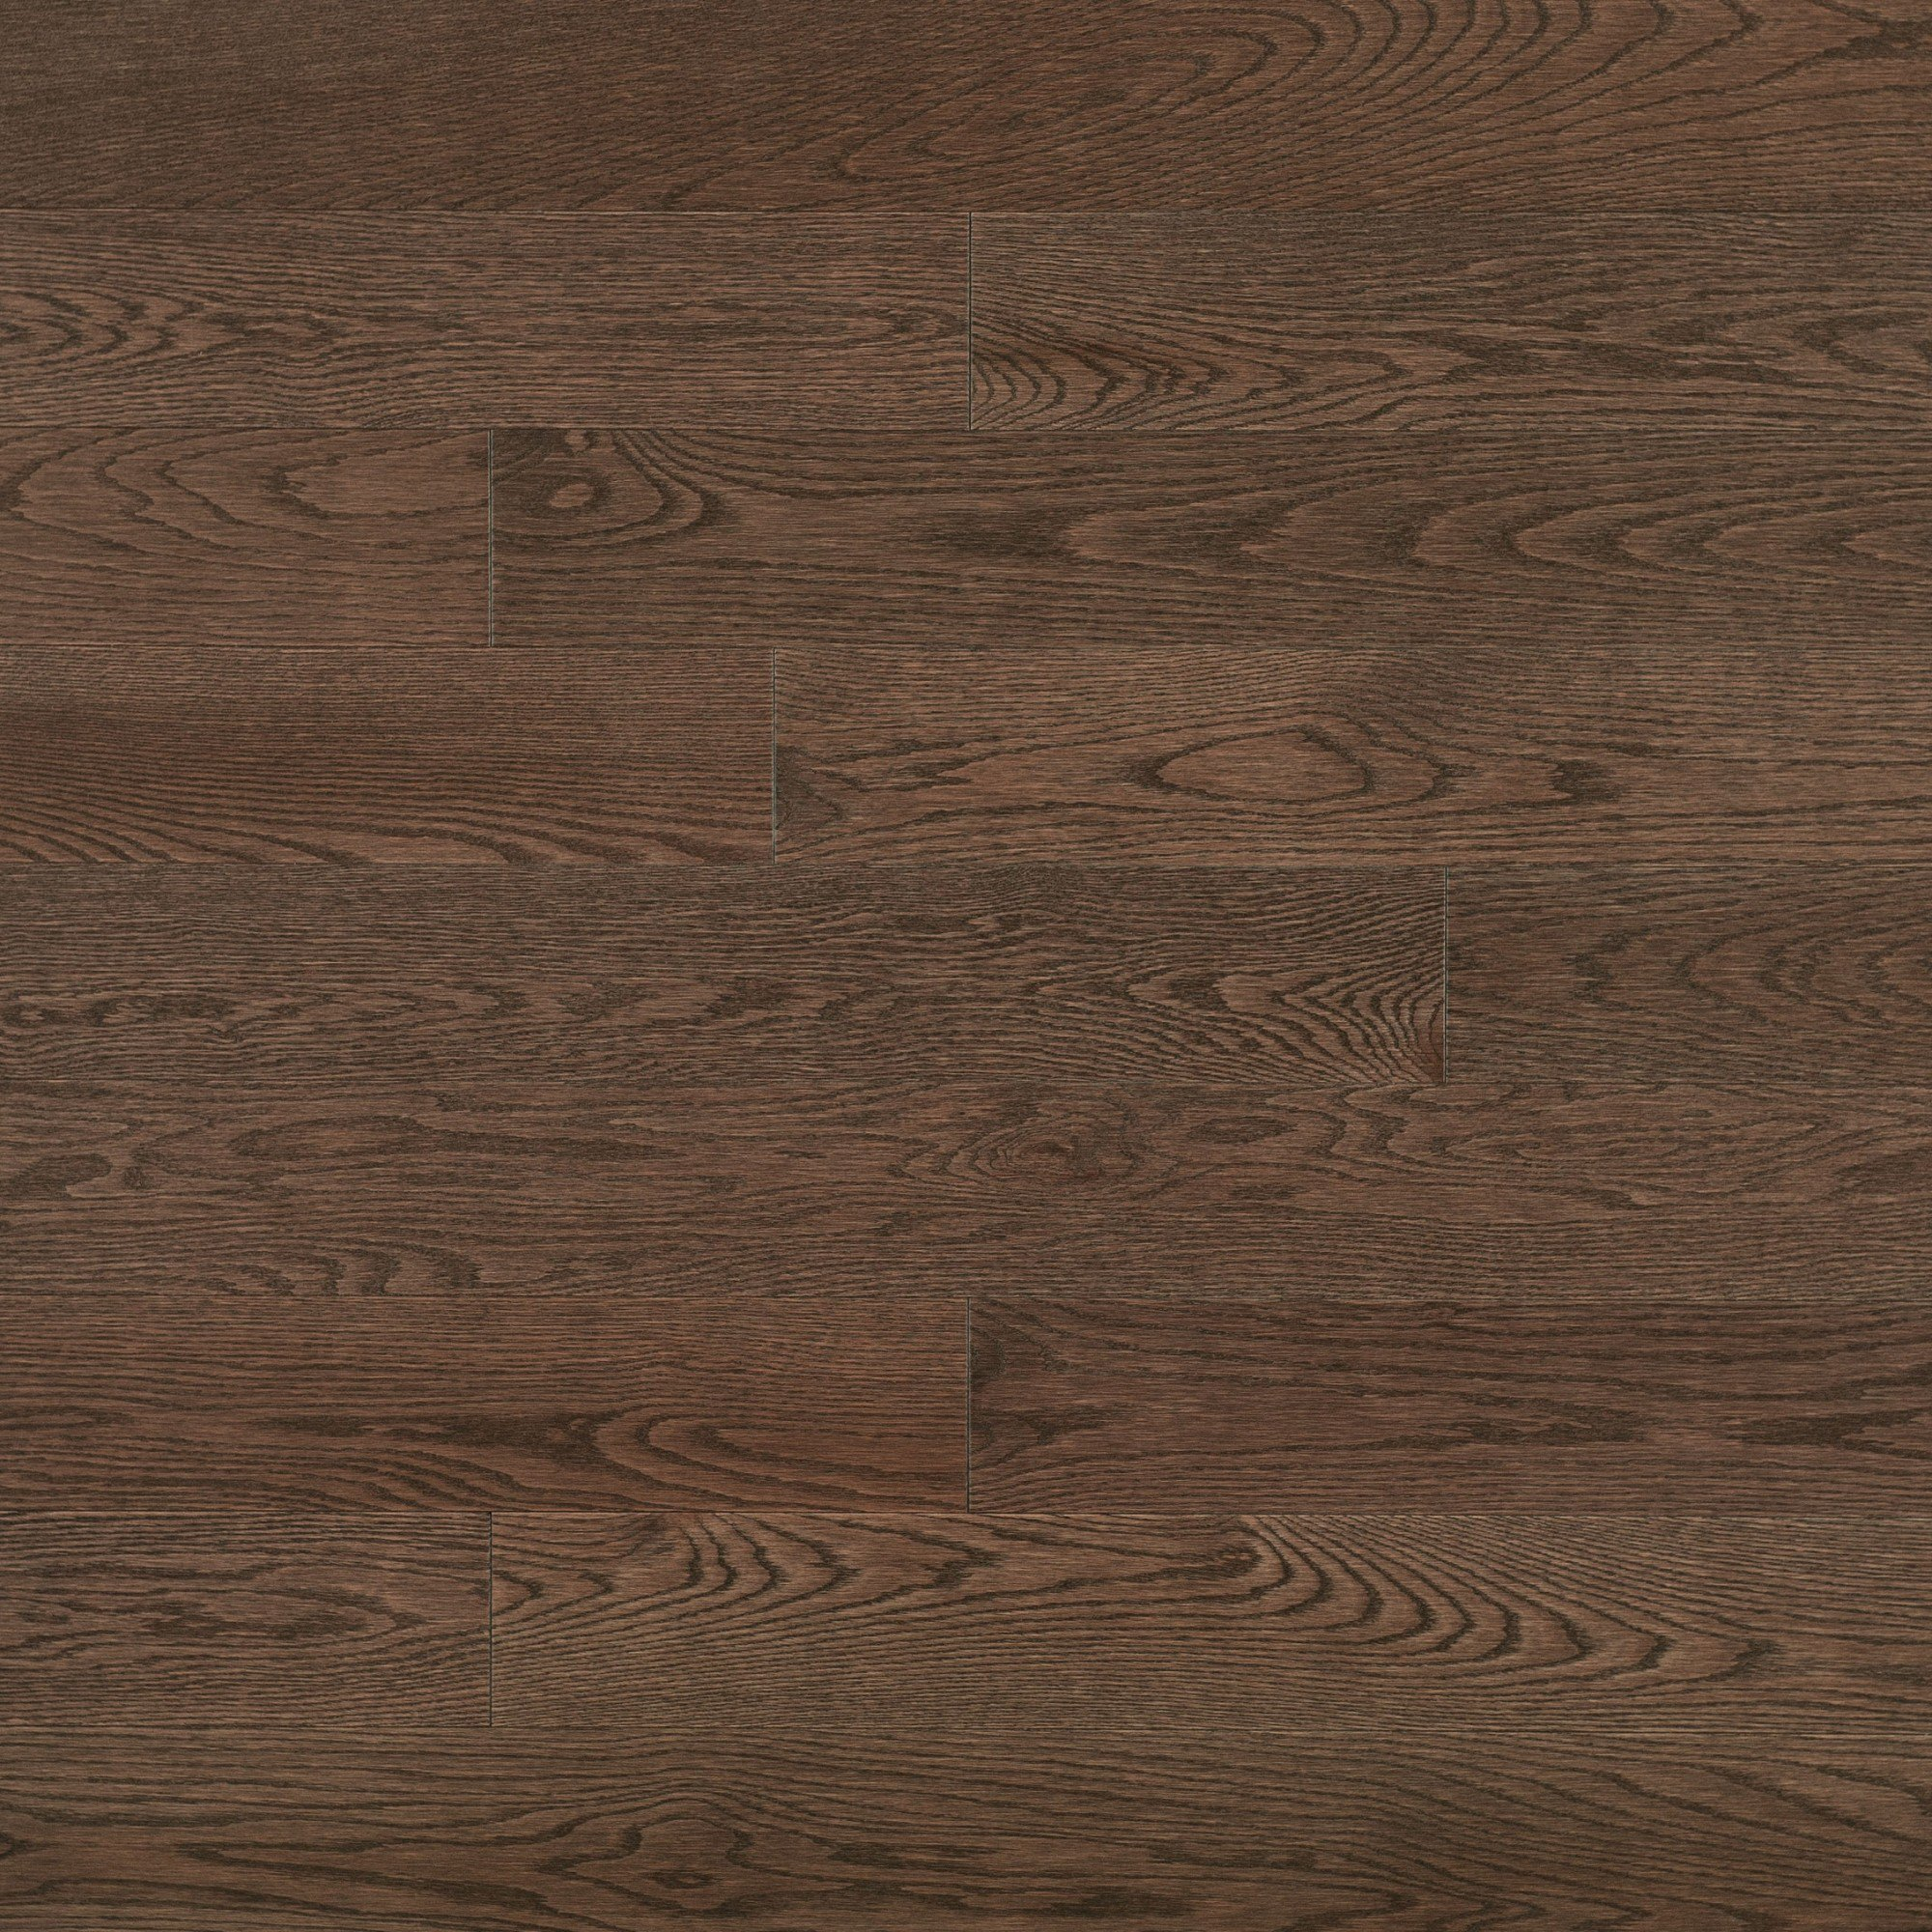 Red Oak Sepia - Floor image